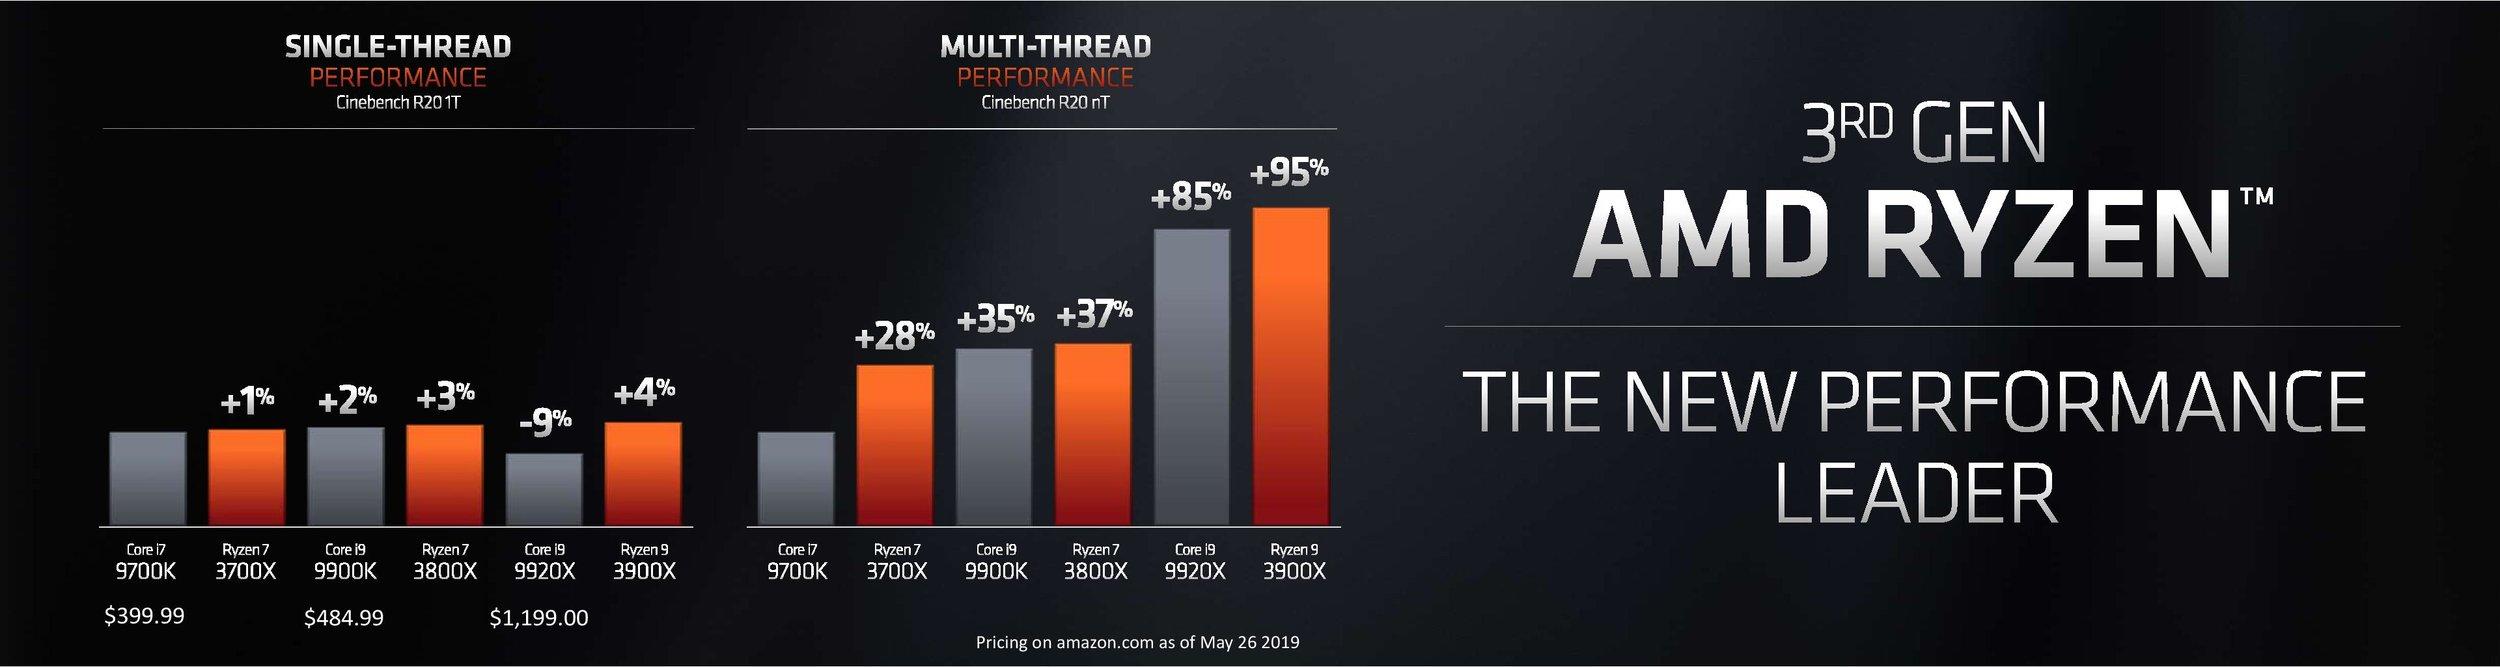 AMD Announces The New Ryzen 3000 7nm Zen 2 Processors — E